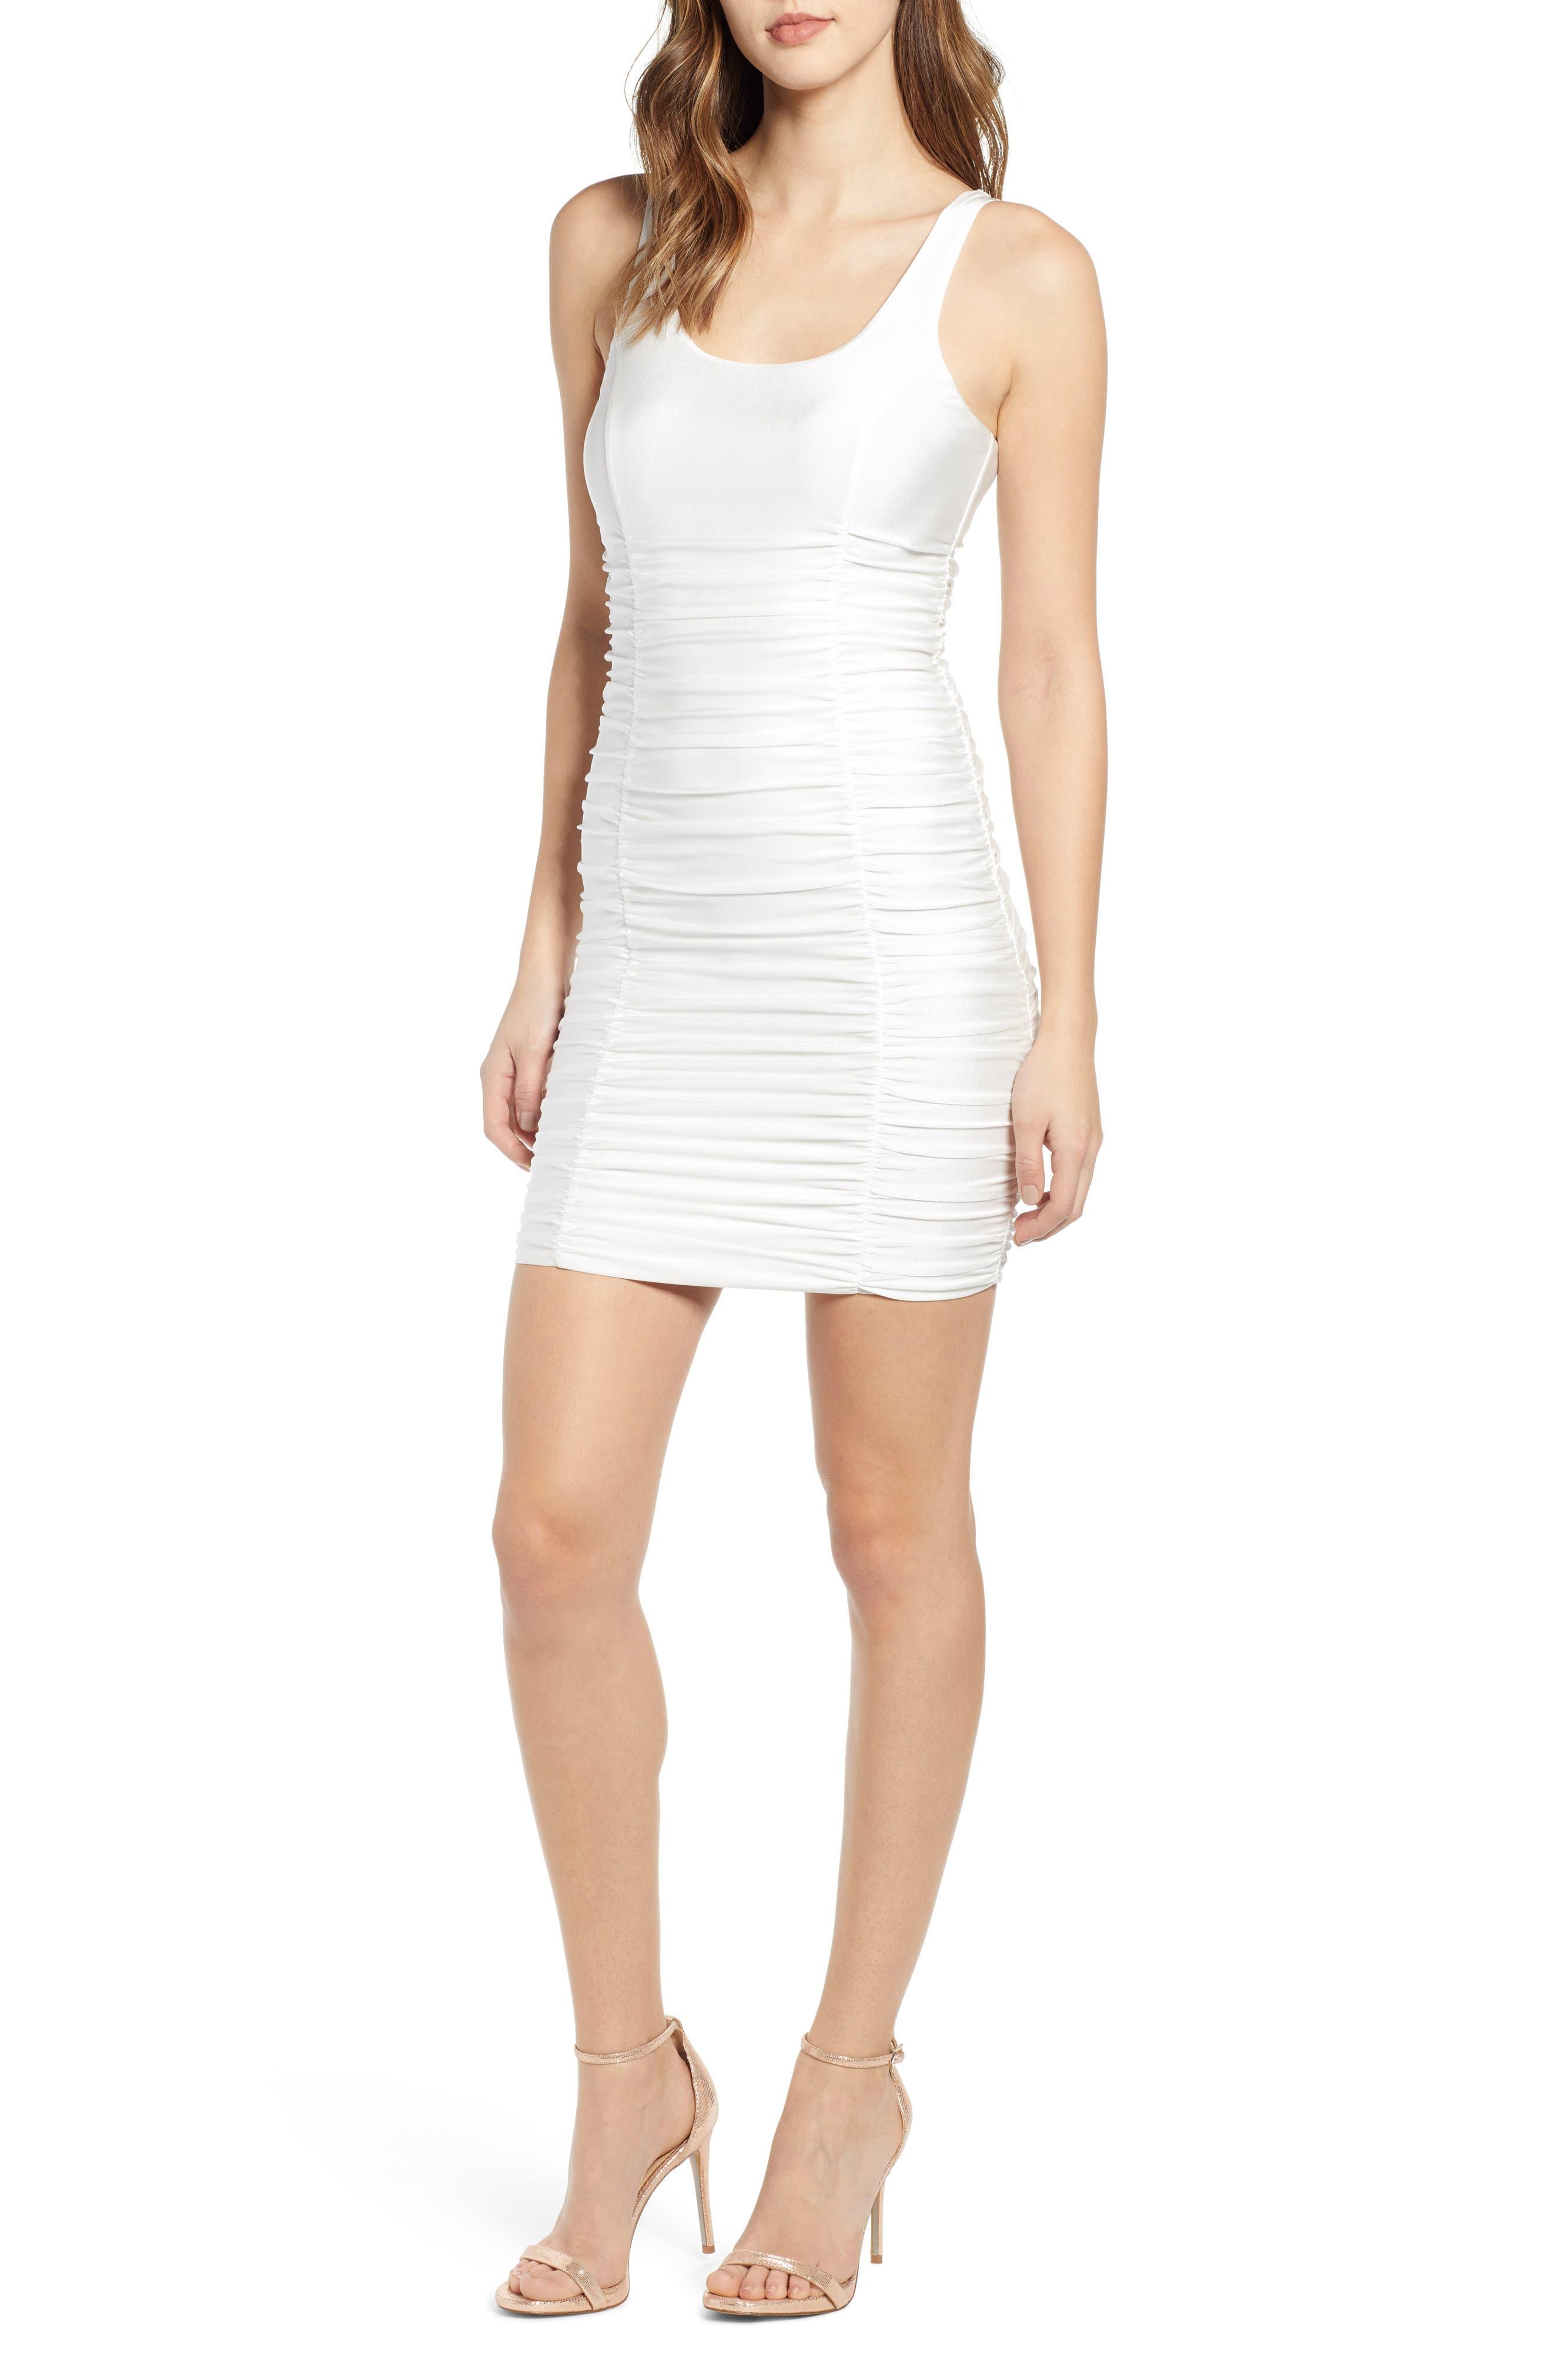 Tiger Mist Santa Clara Body-Con Dress, White